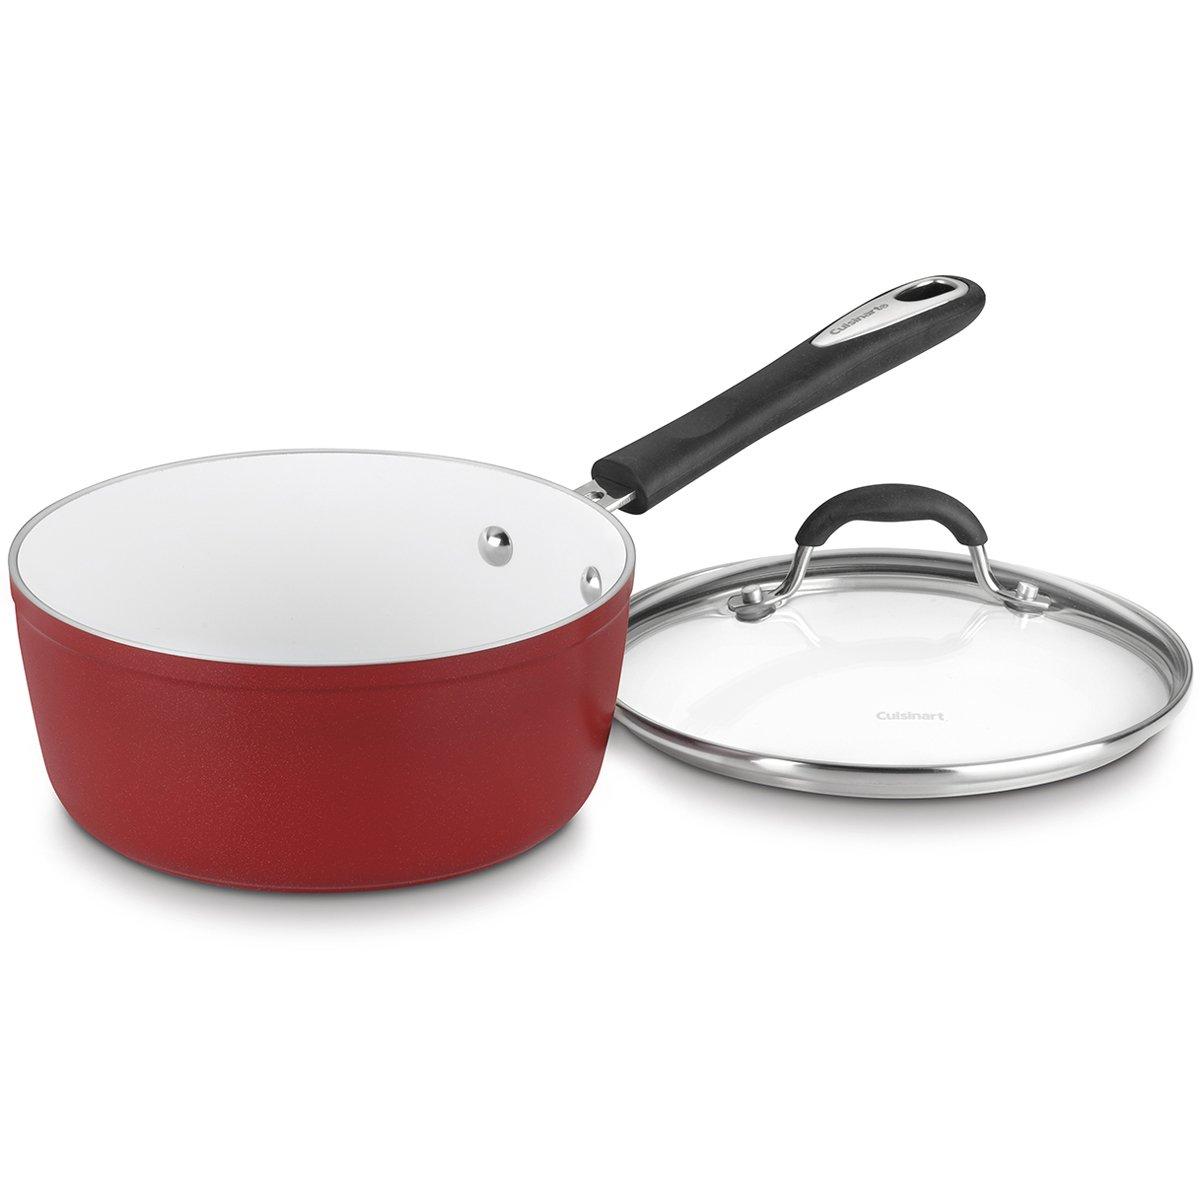 Cuisinart 5919-18R Elements Saucepan, 2-Quart, Red